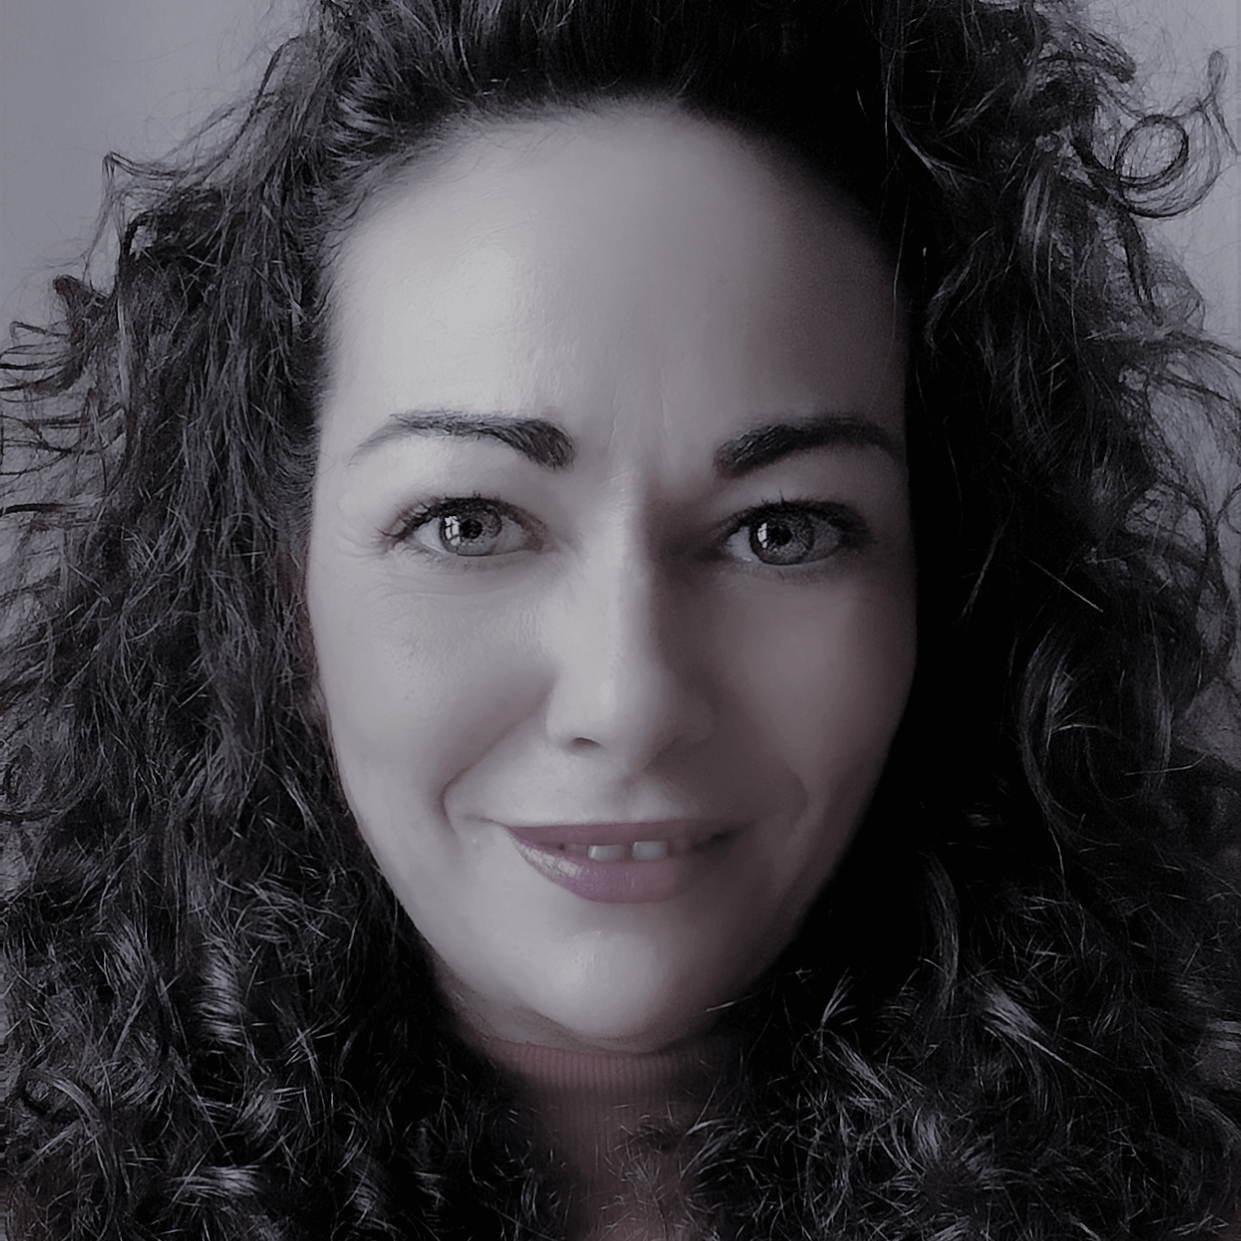 Vanesa Corbo Lozano